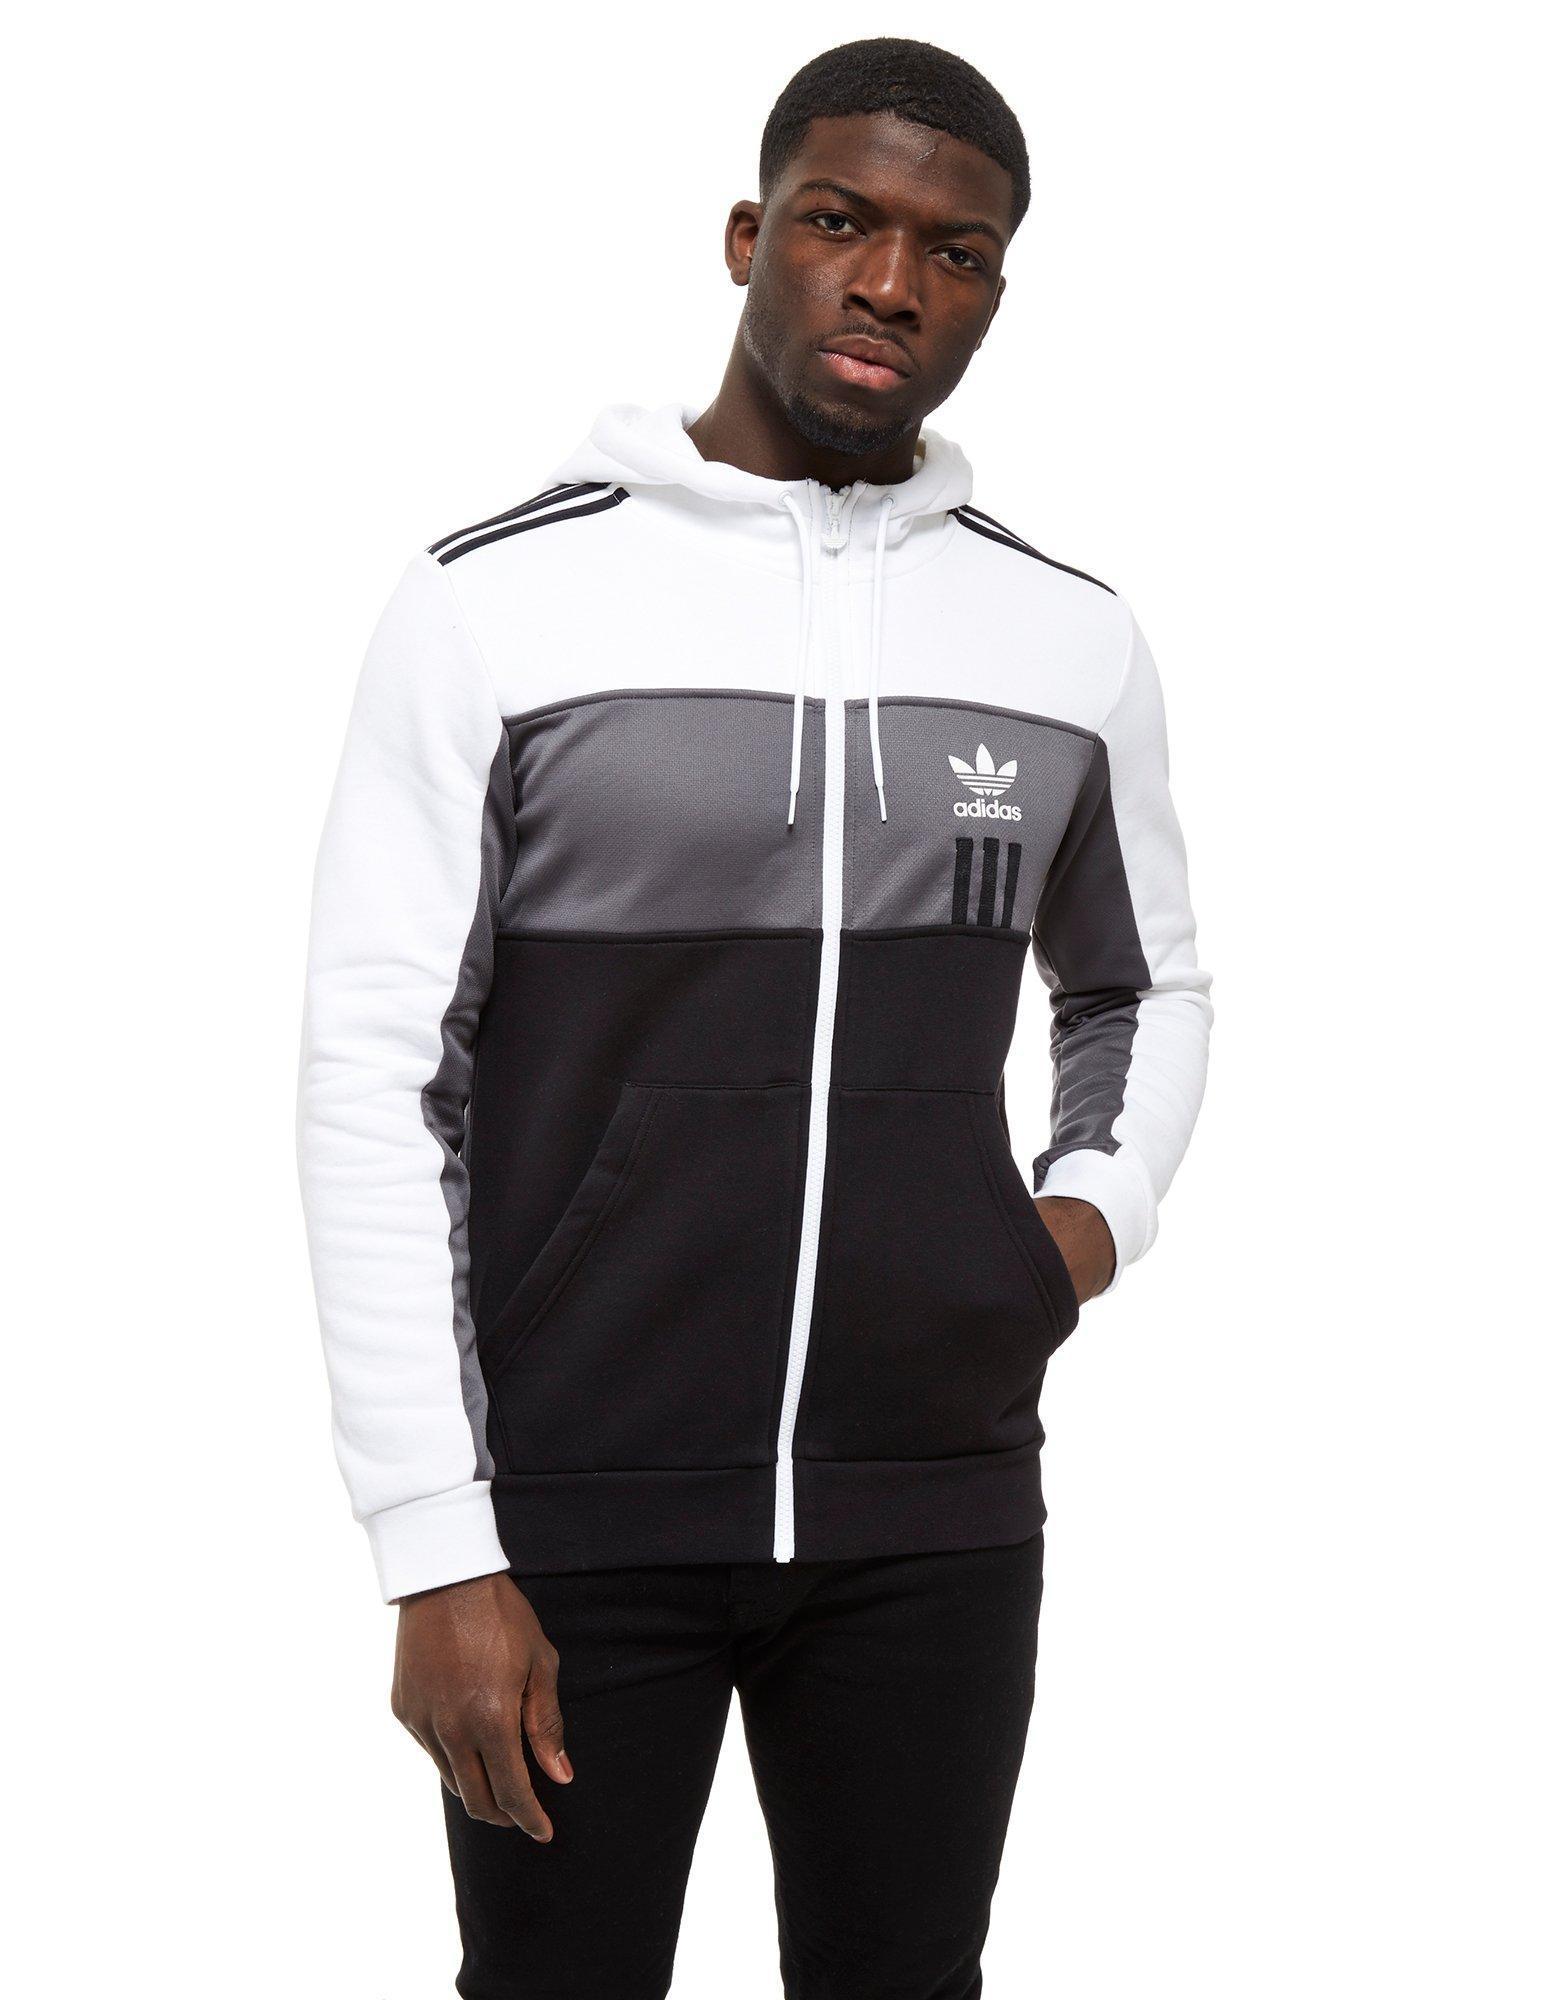 af9c6f2963d681 adidas Originals Id96 Full Zip Hoodie in Black for Men - Lyst